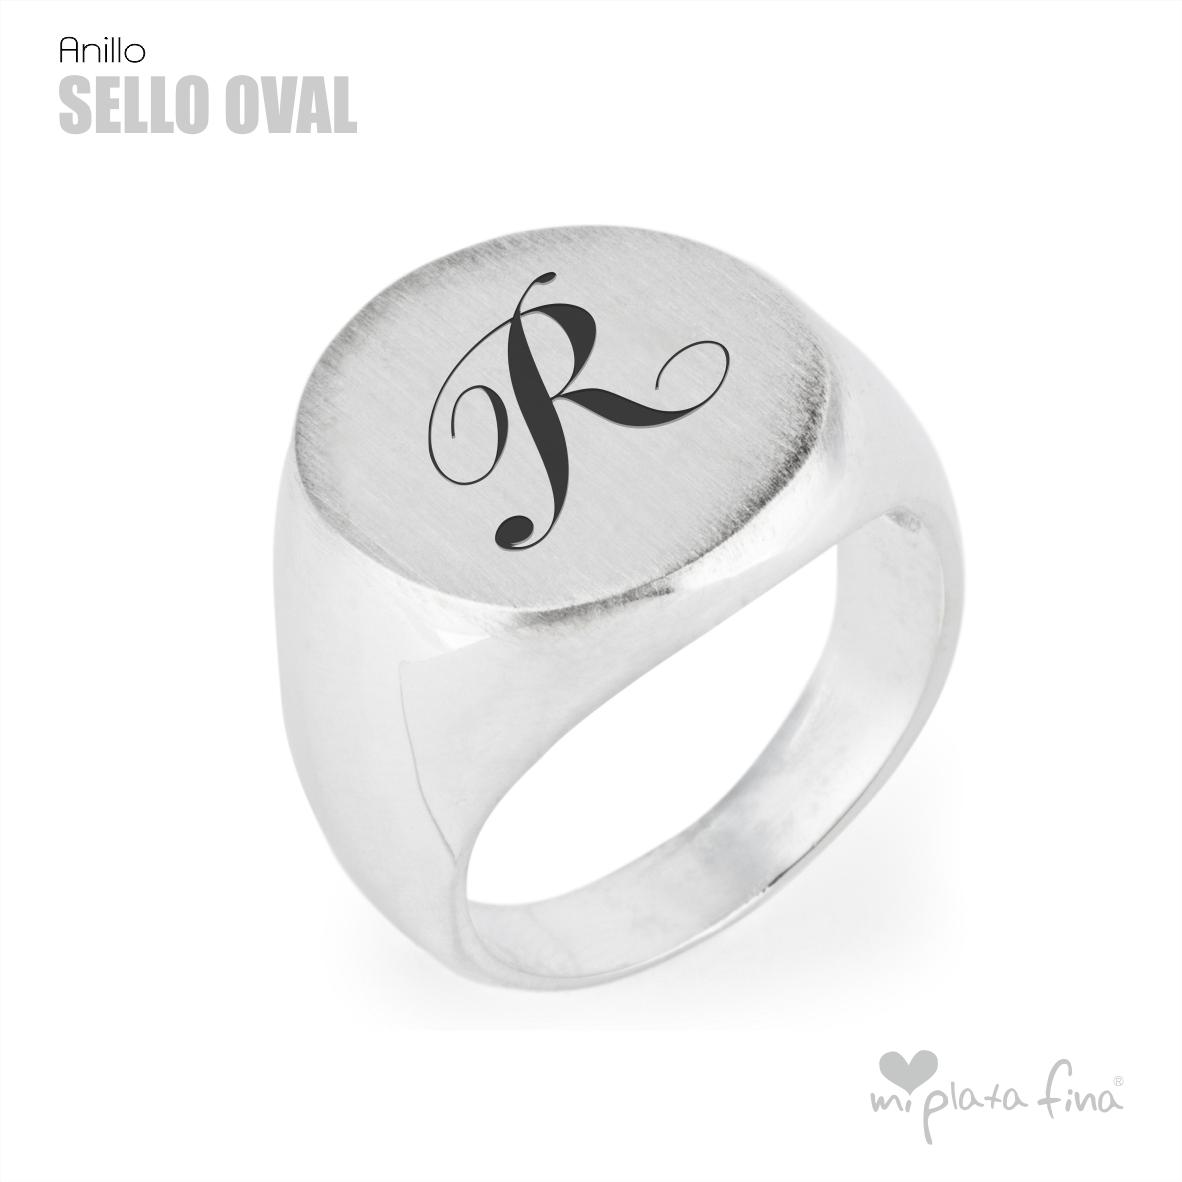 anillo sello oval inicial r